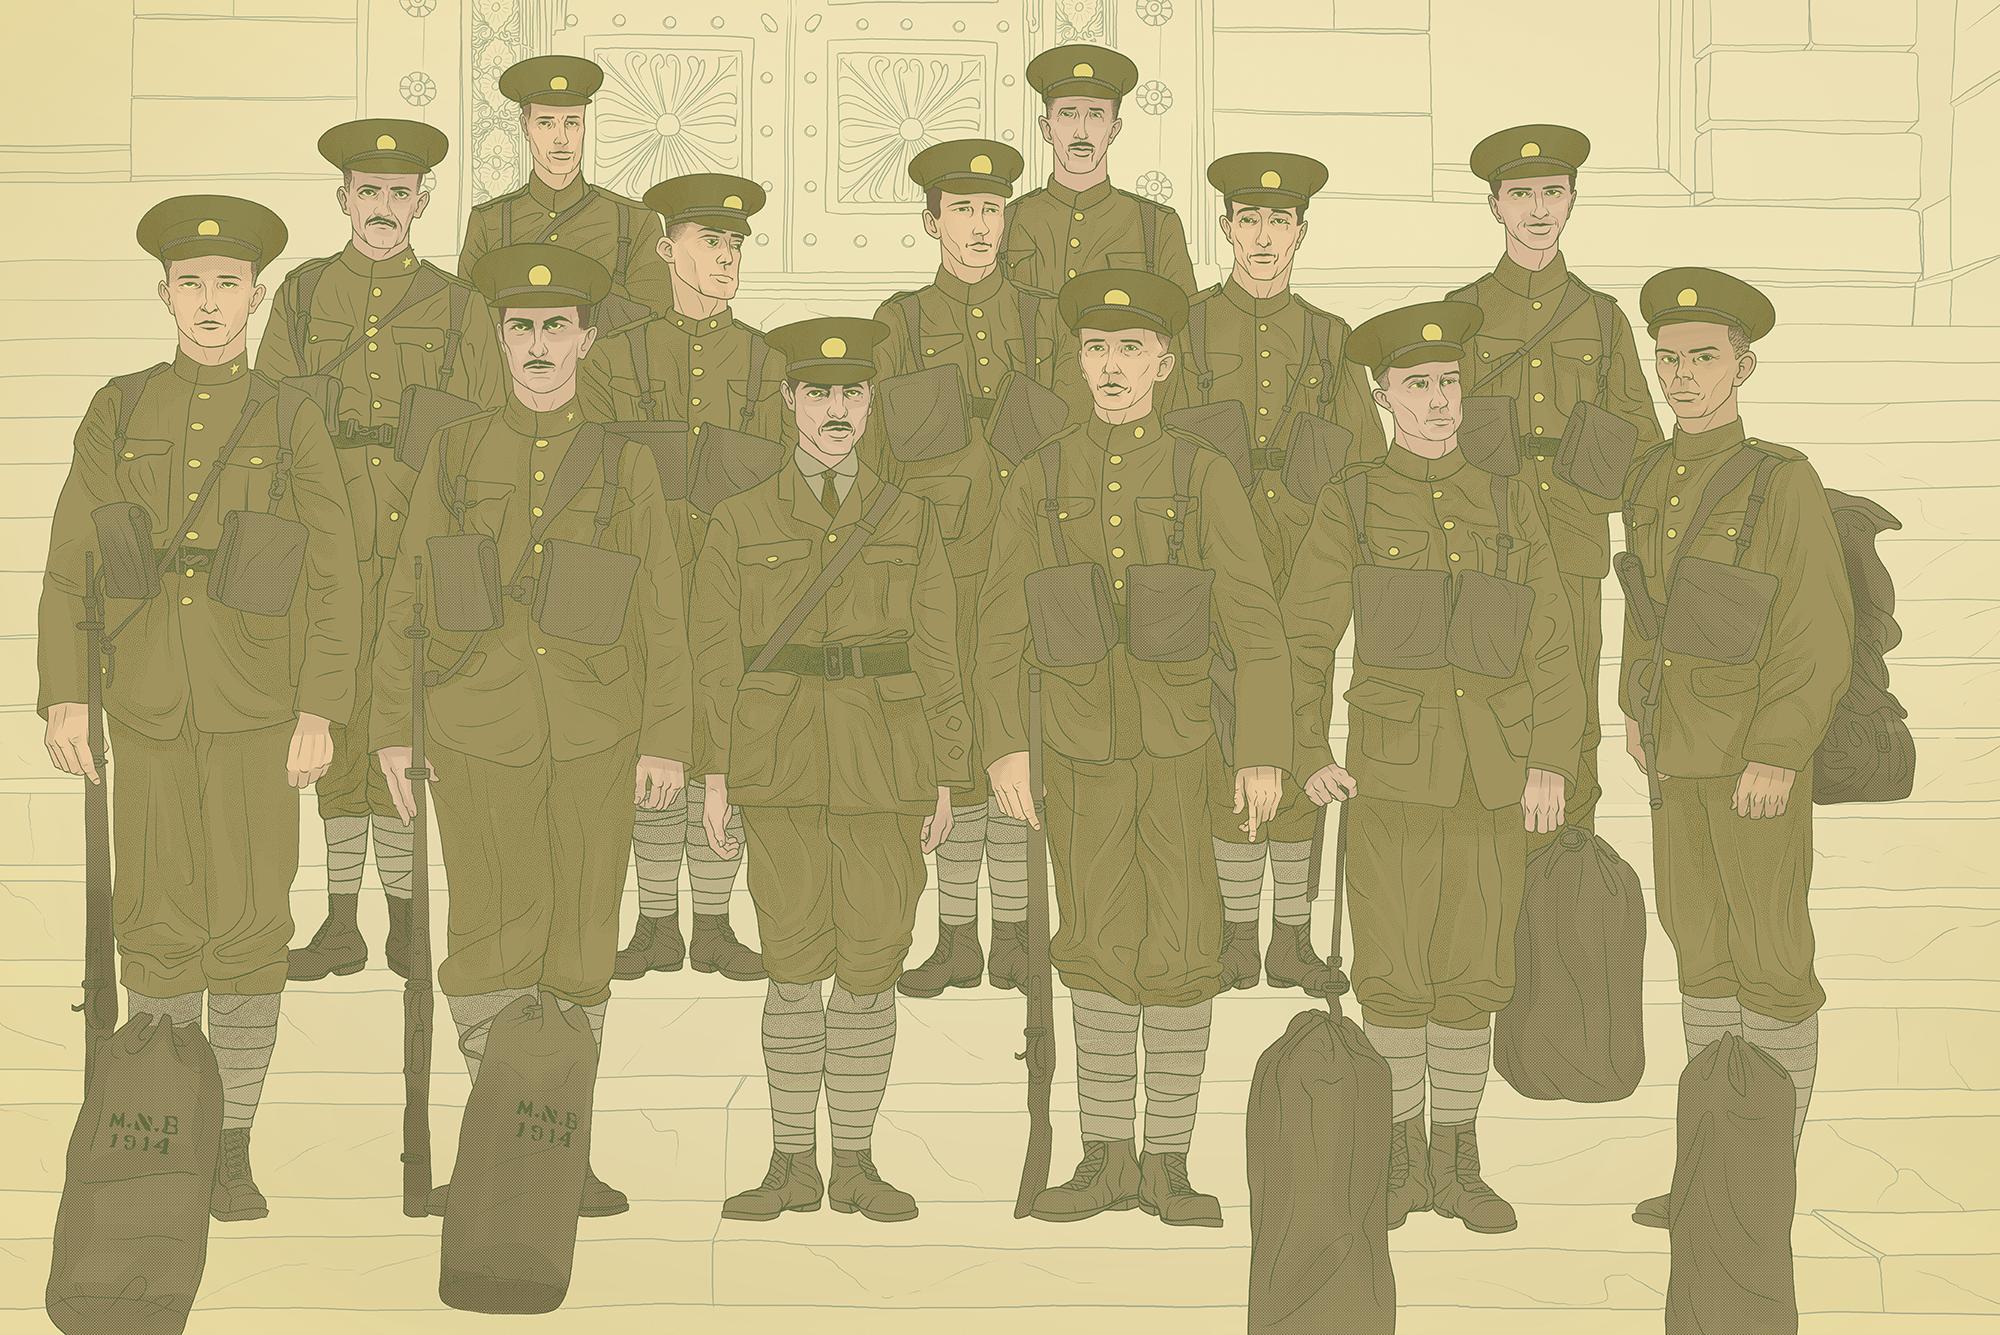 University of Alberta soldiers, Montreal, 1915. Illustration by Jordan Carson